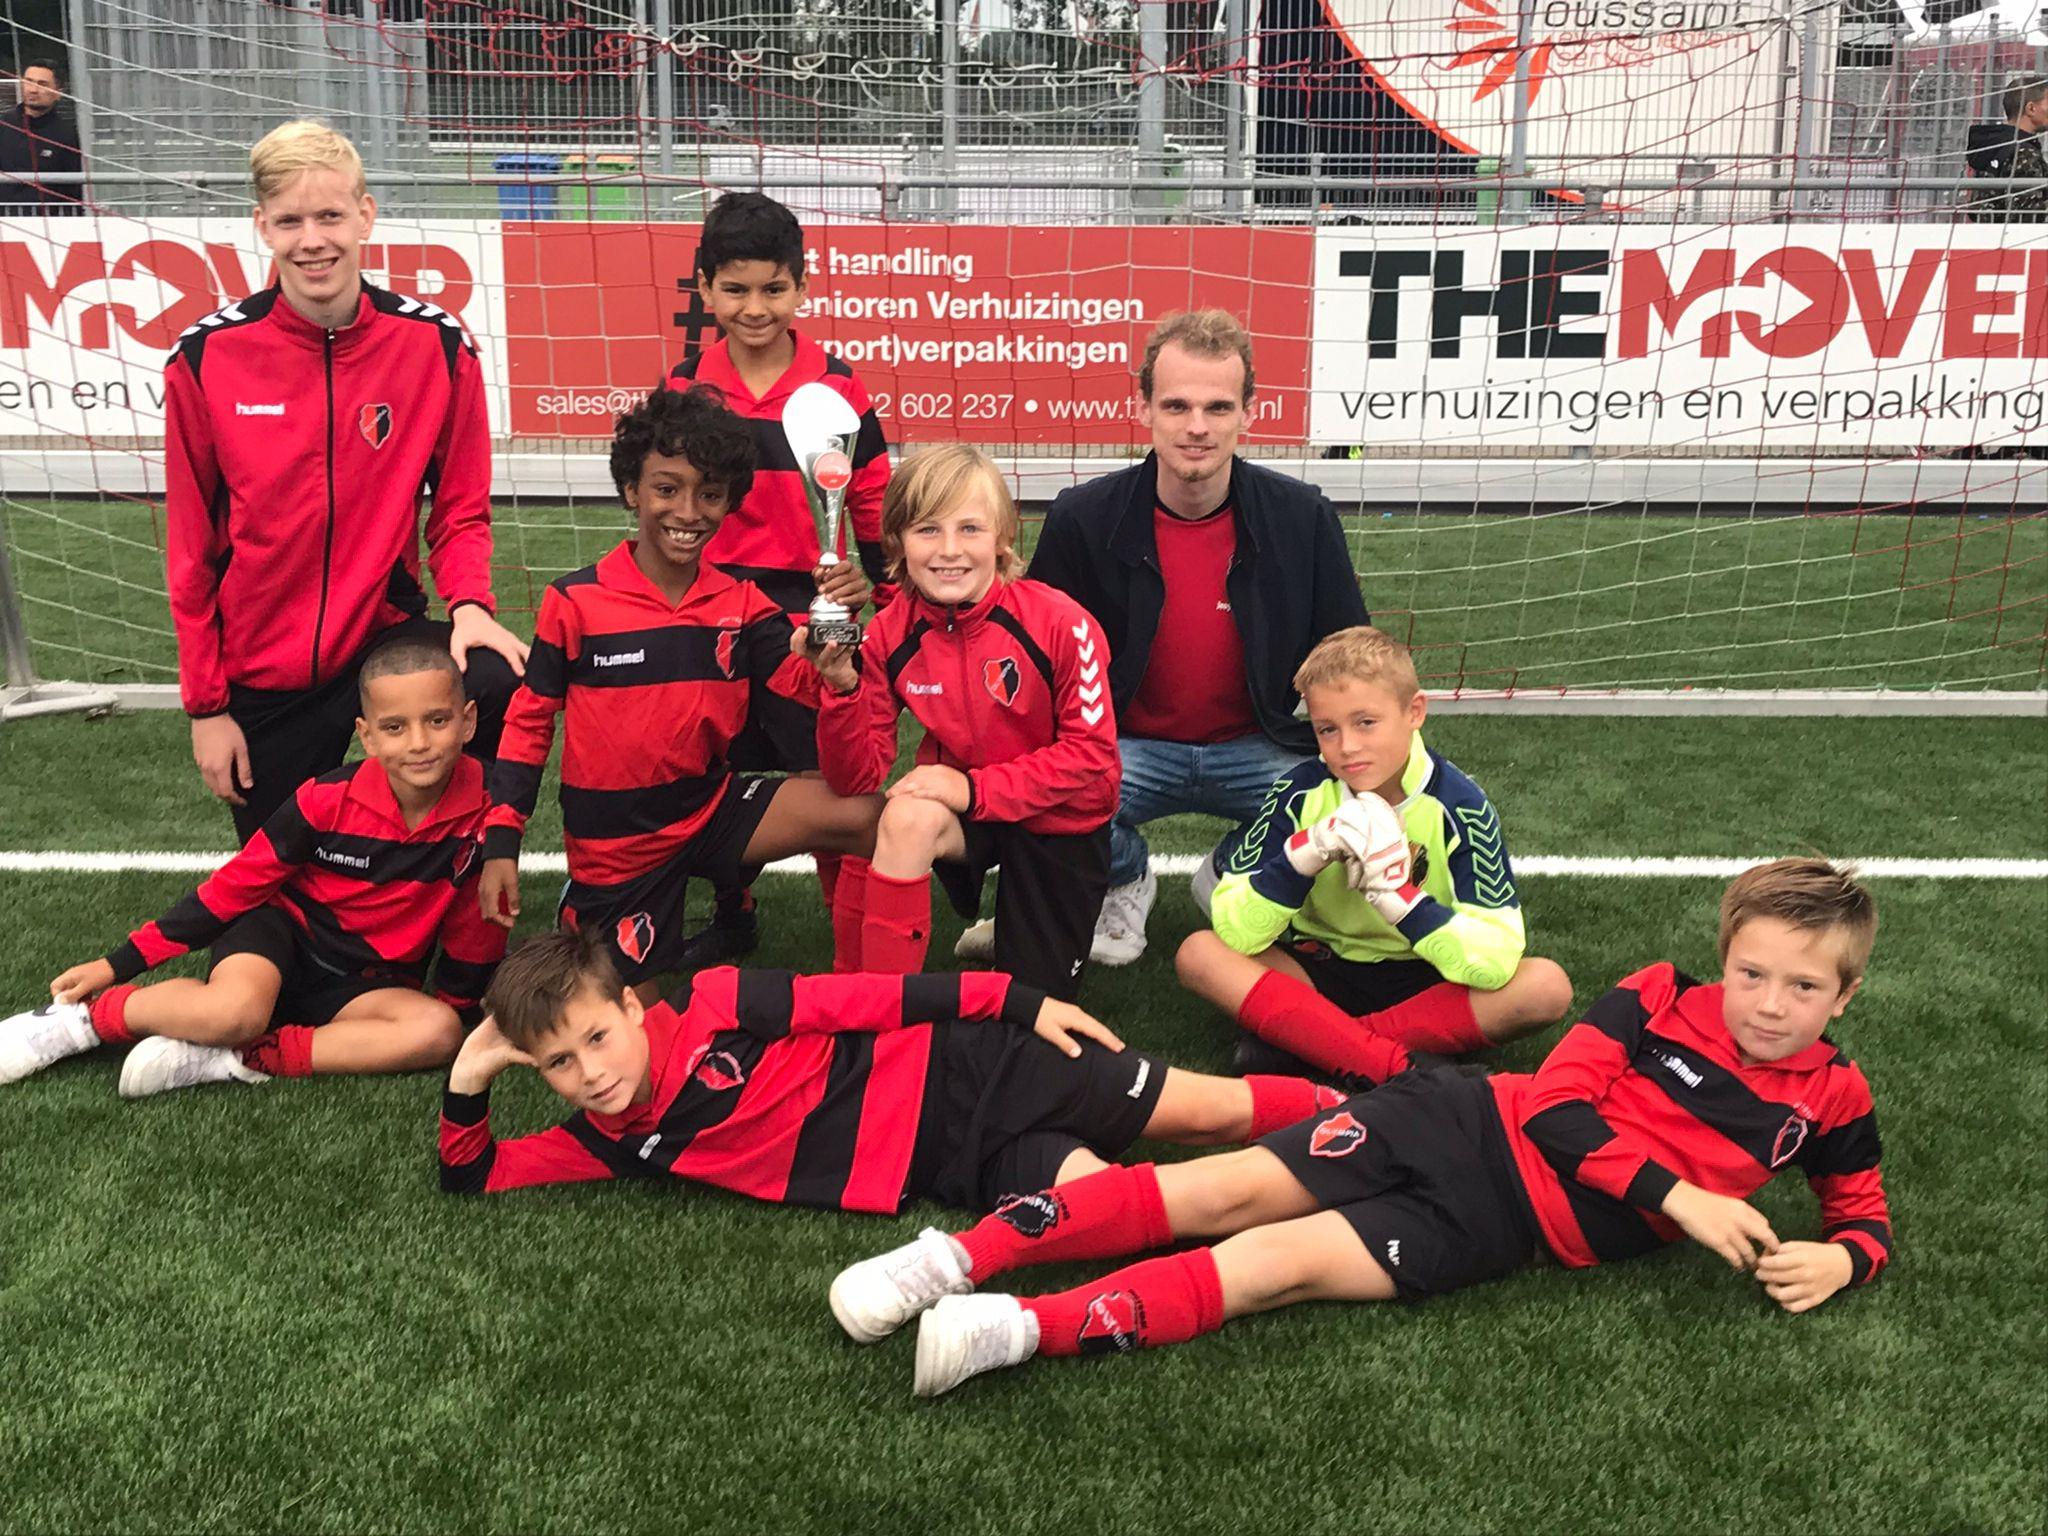 JO10-1 pakt 3e plaats op Alphense Boys toernooi